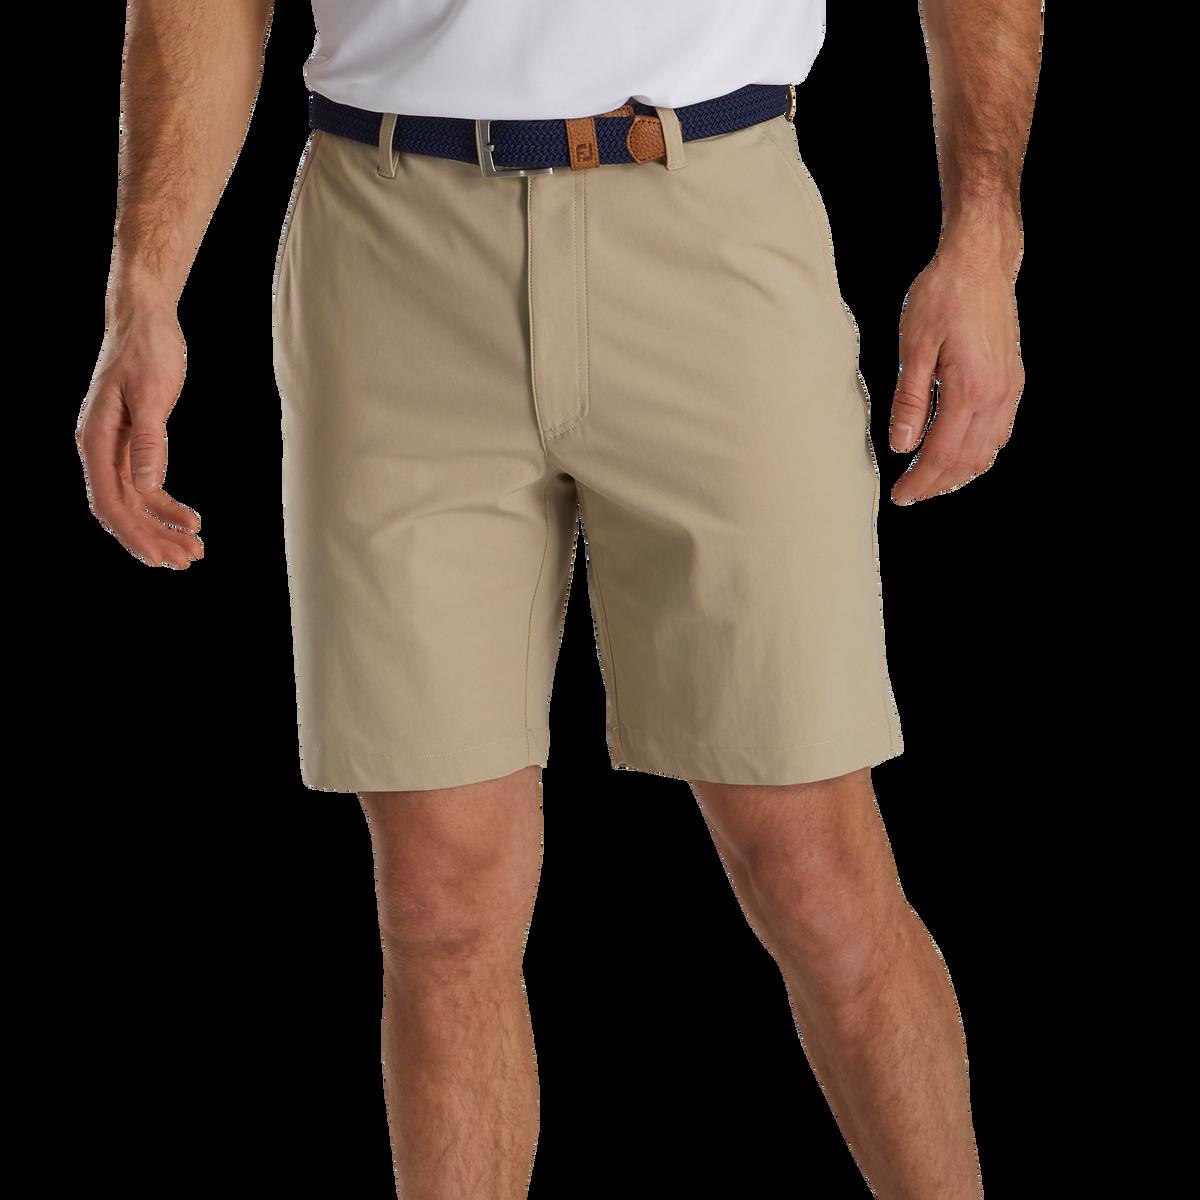 Knit Shorts 9.5 Inch Inseam